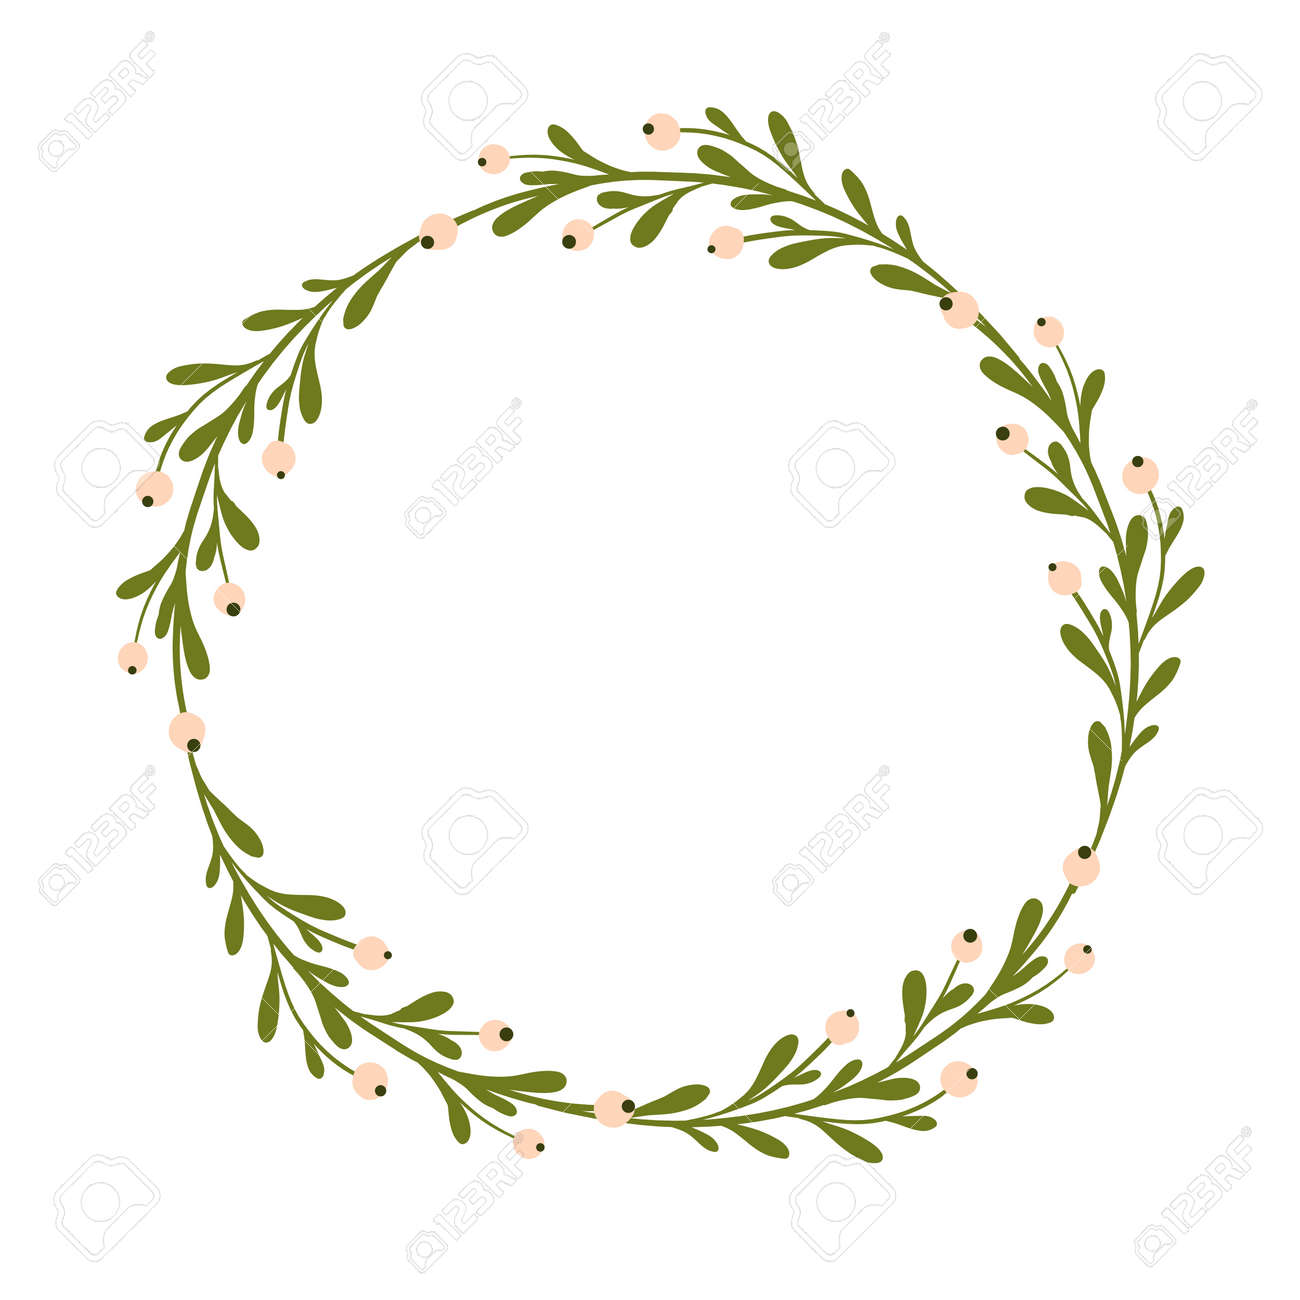 Cute And Gentle Handsketched Mistletoe Wreath Seasonal Background Decor Seasons Greetings